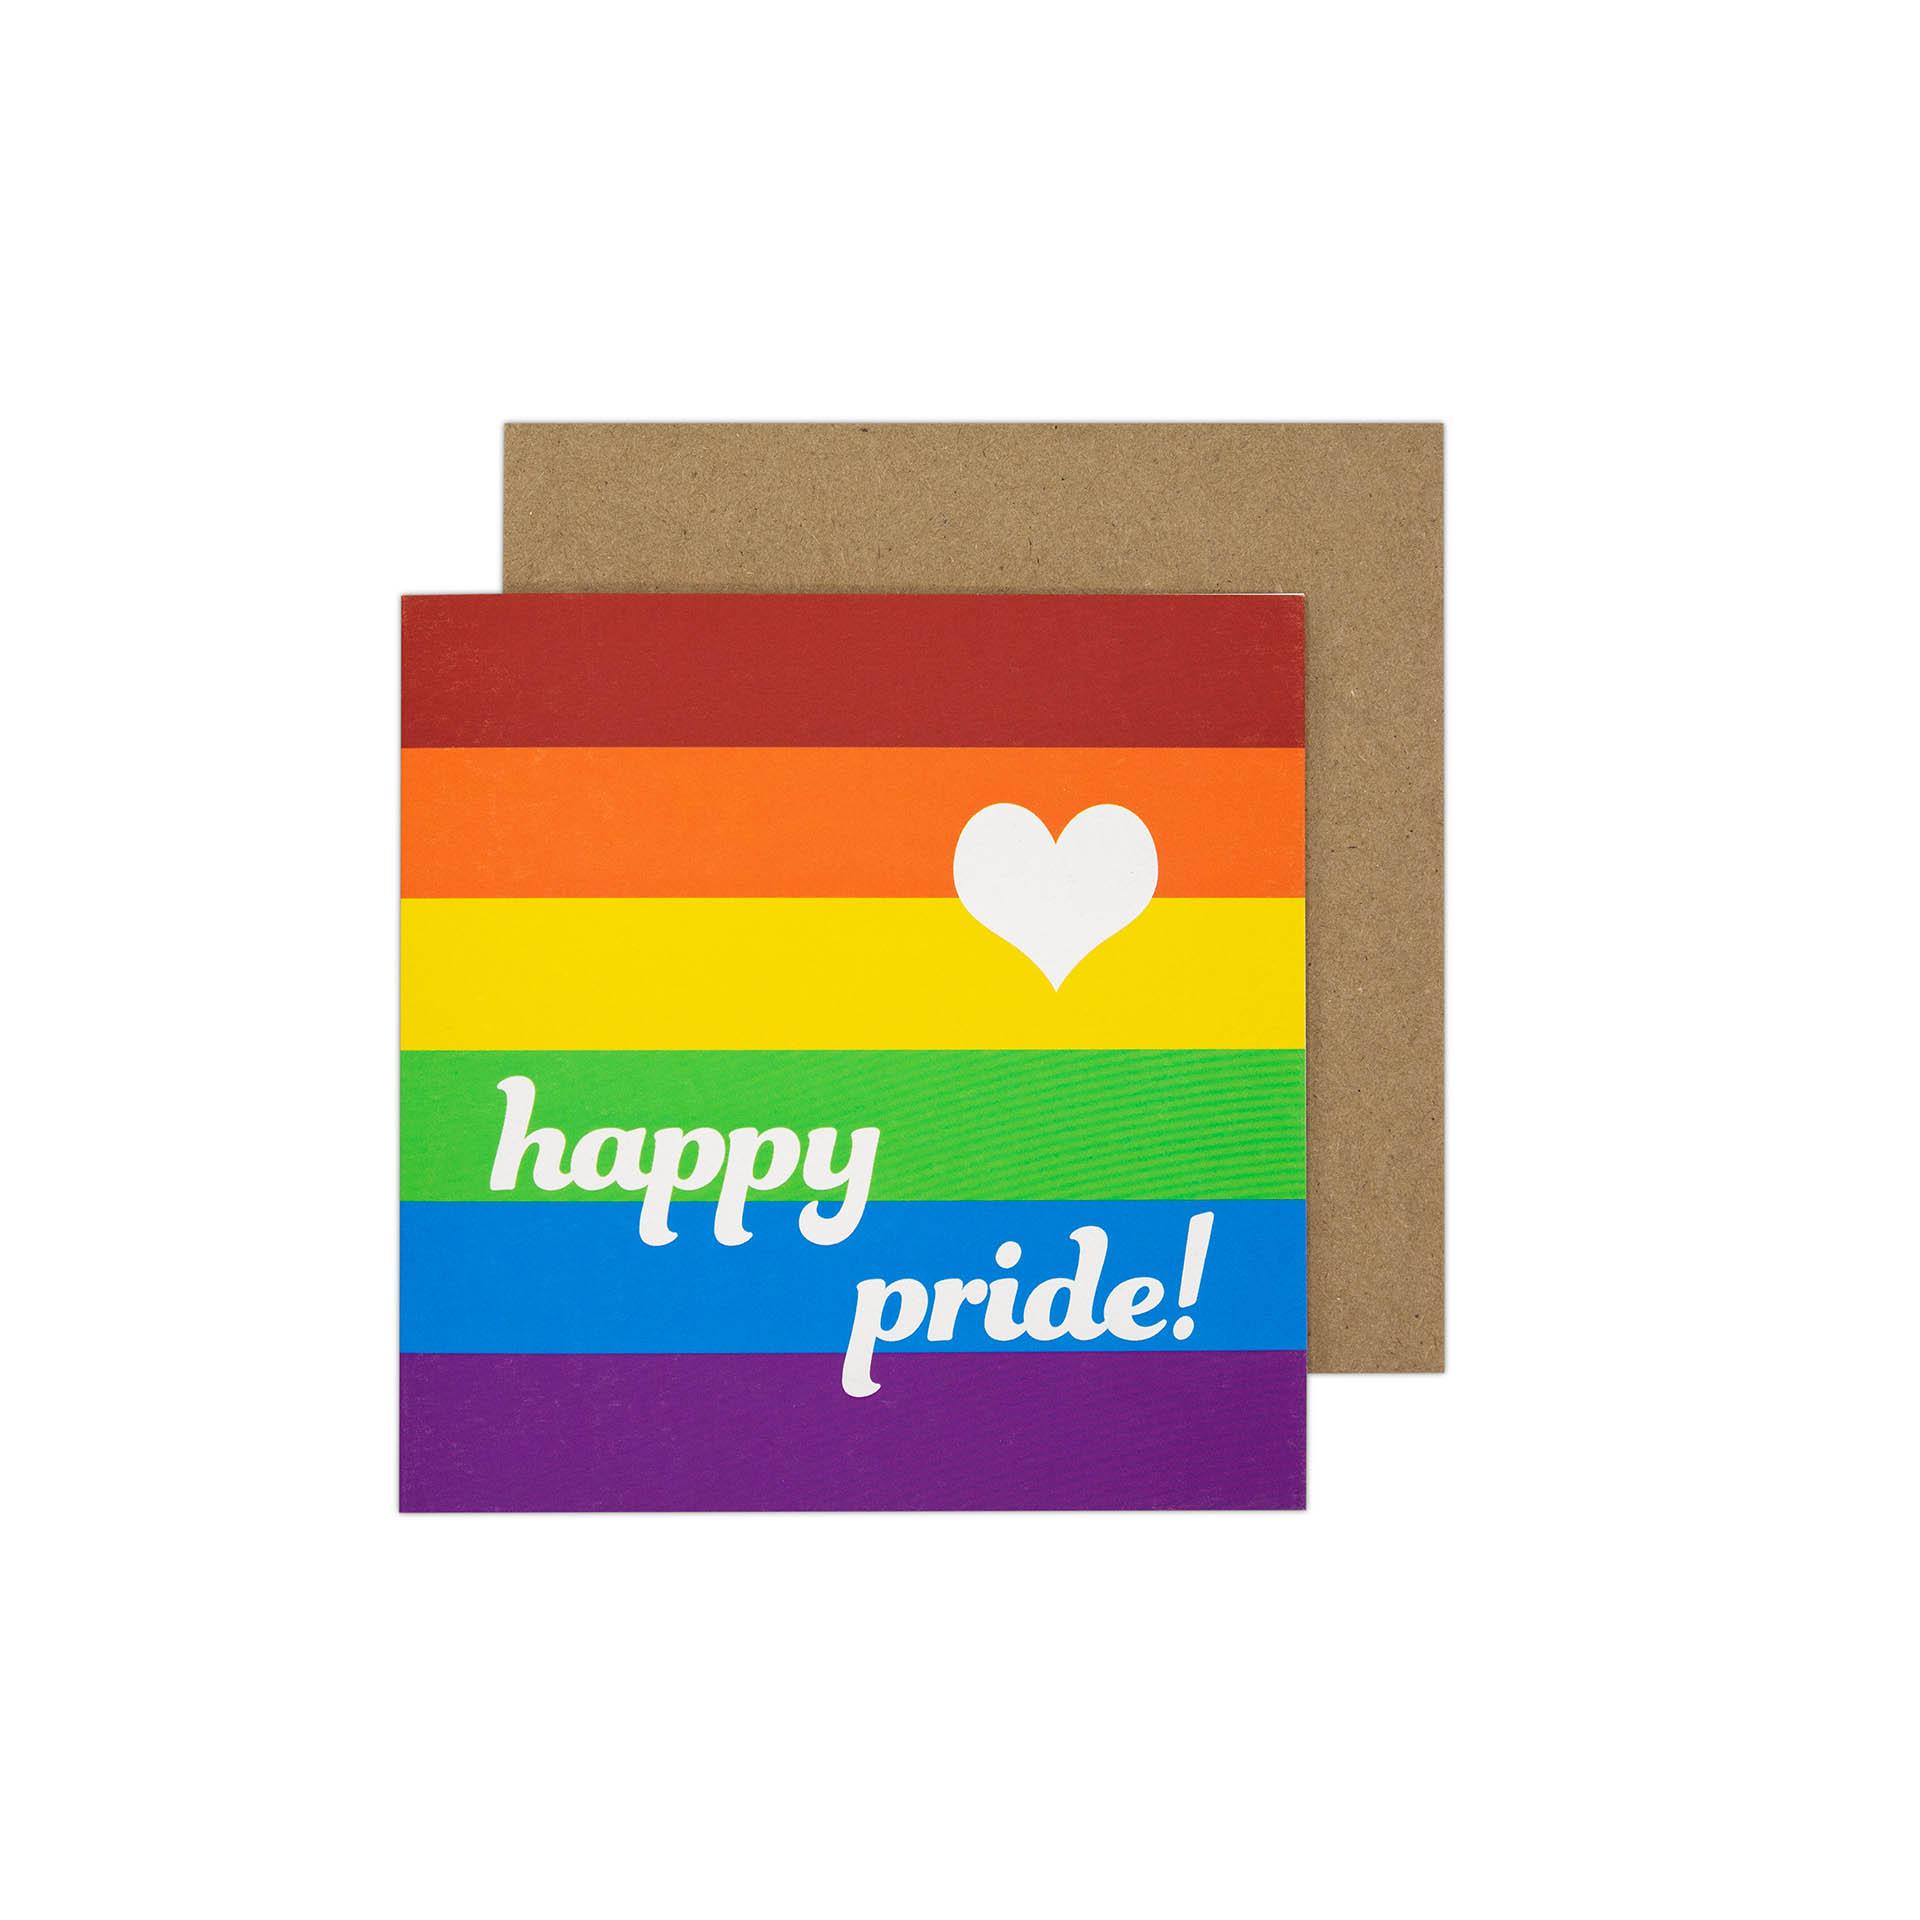 LGBTQ product photos